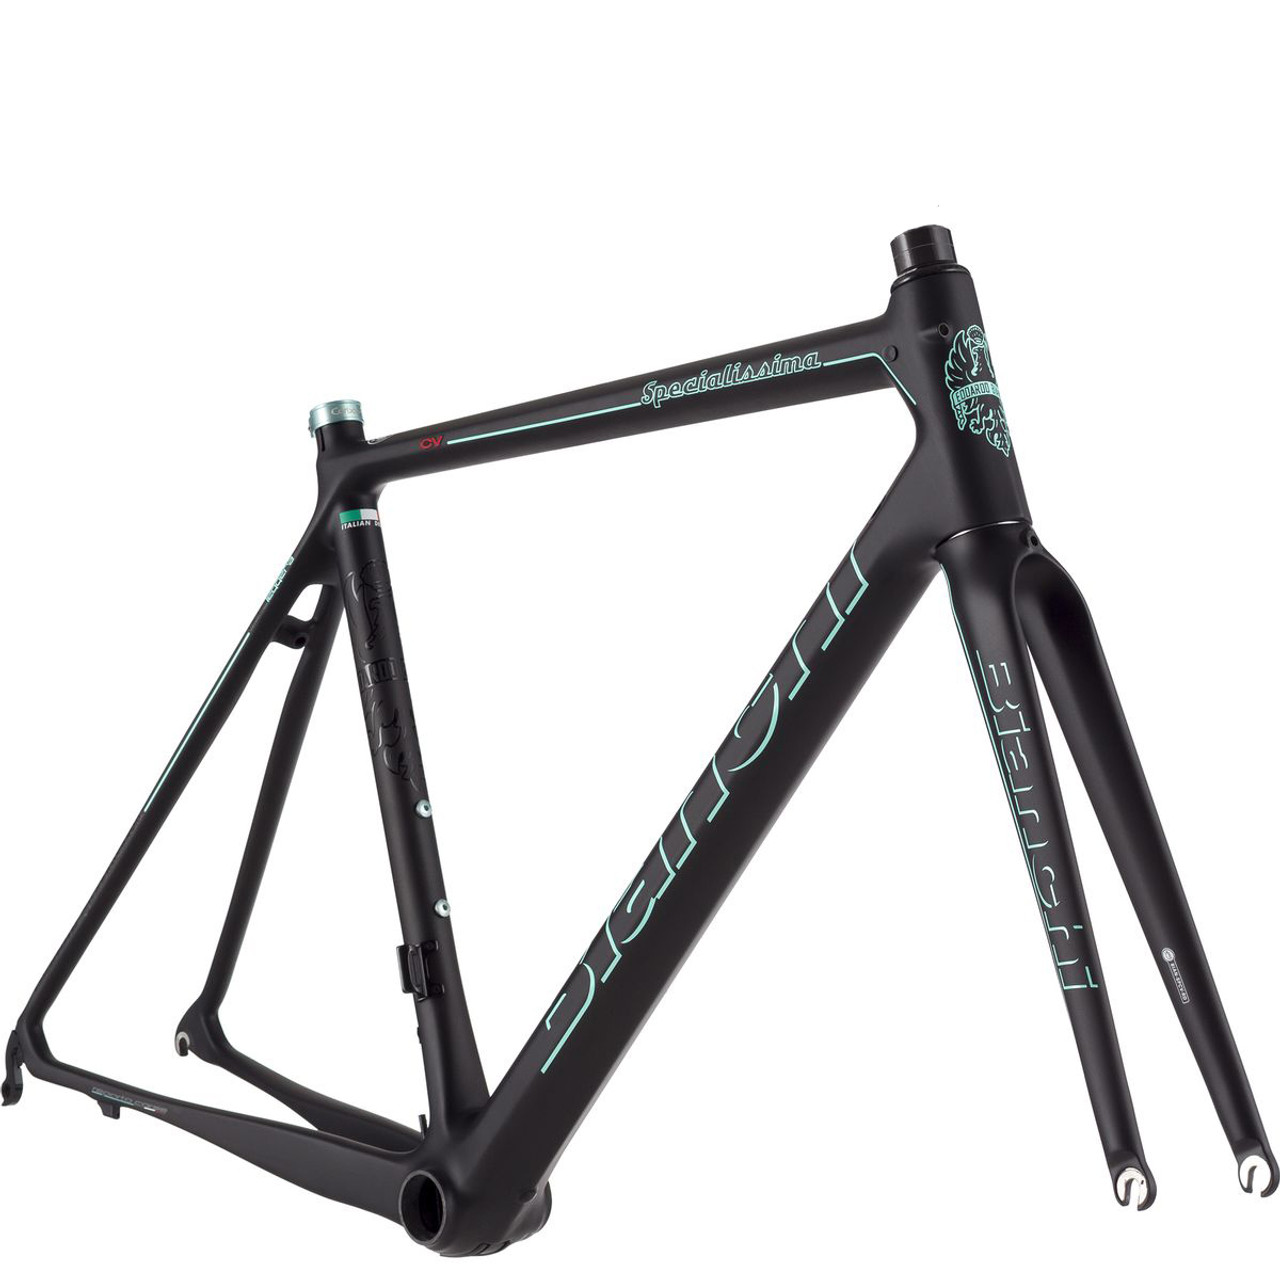 Texas Cyclesport Bianchi Specialissima Frameset, Black BI-SPL-FR-BK ...